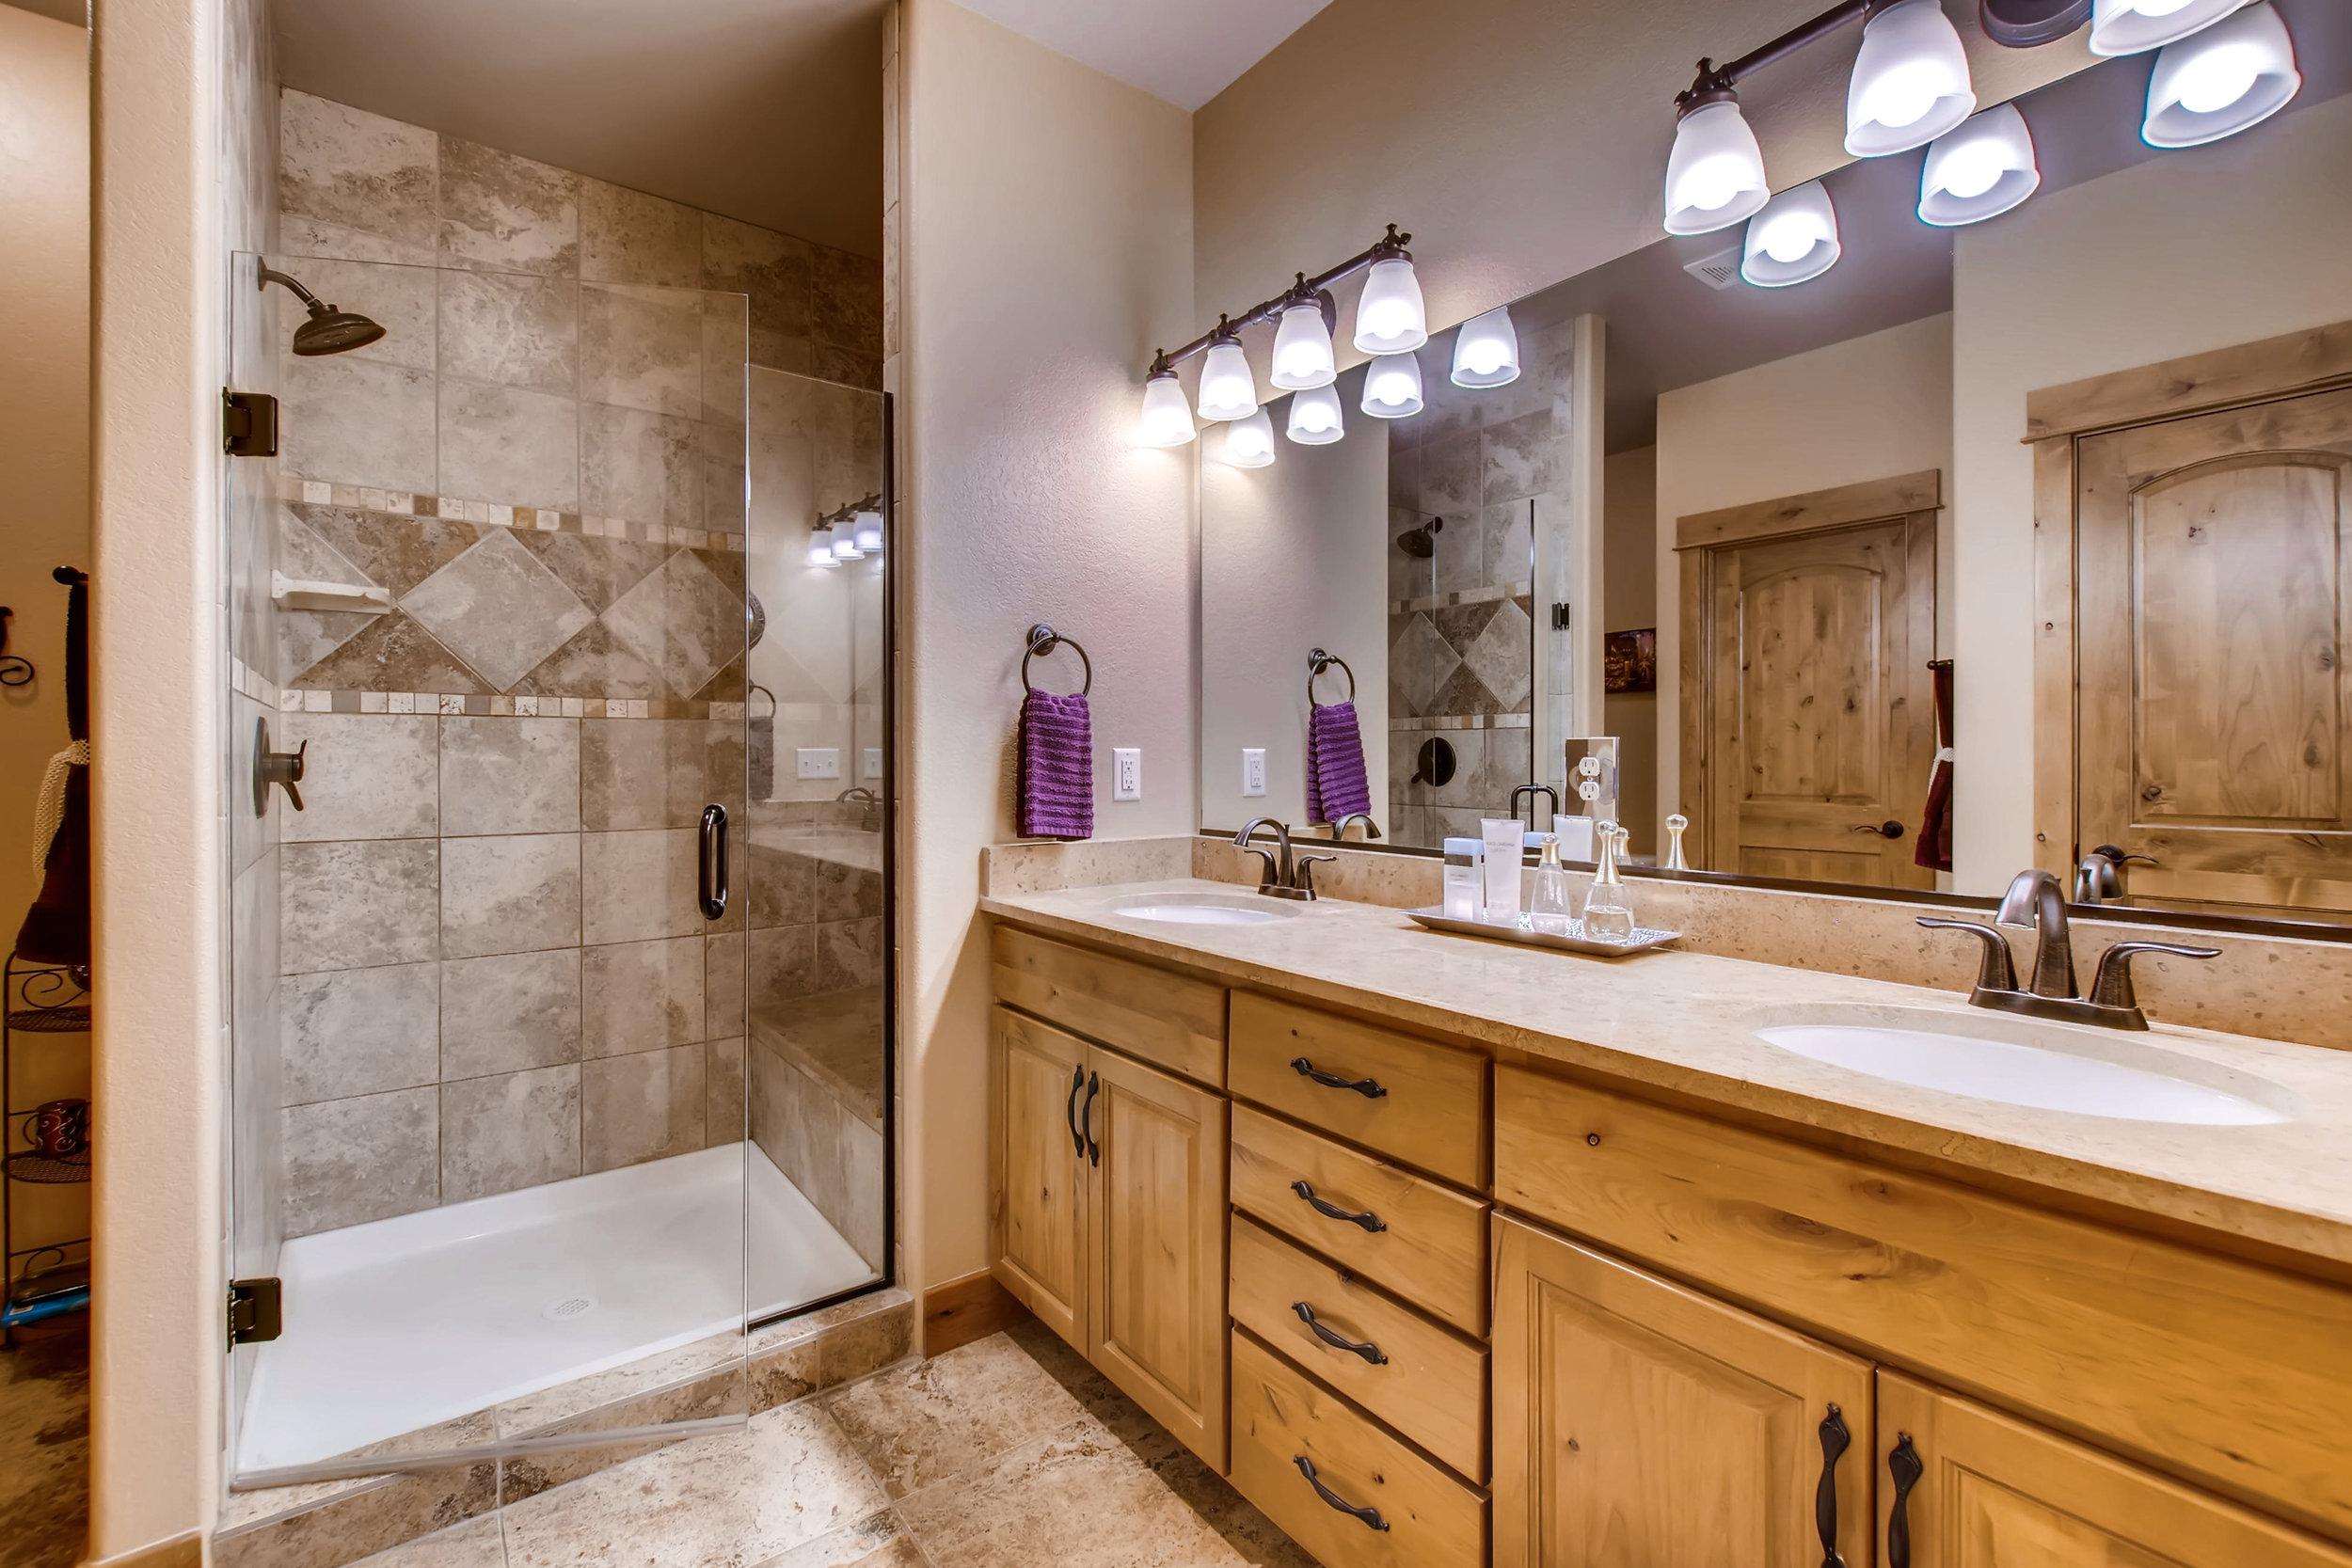 4749 Tarragon Dr Johnstown CO-print-019-4-Master Bathroom-3600x2400-300dpi.jpg